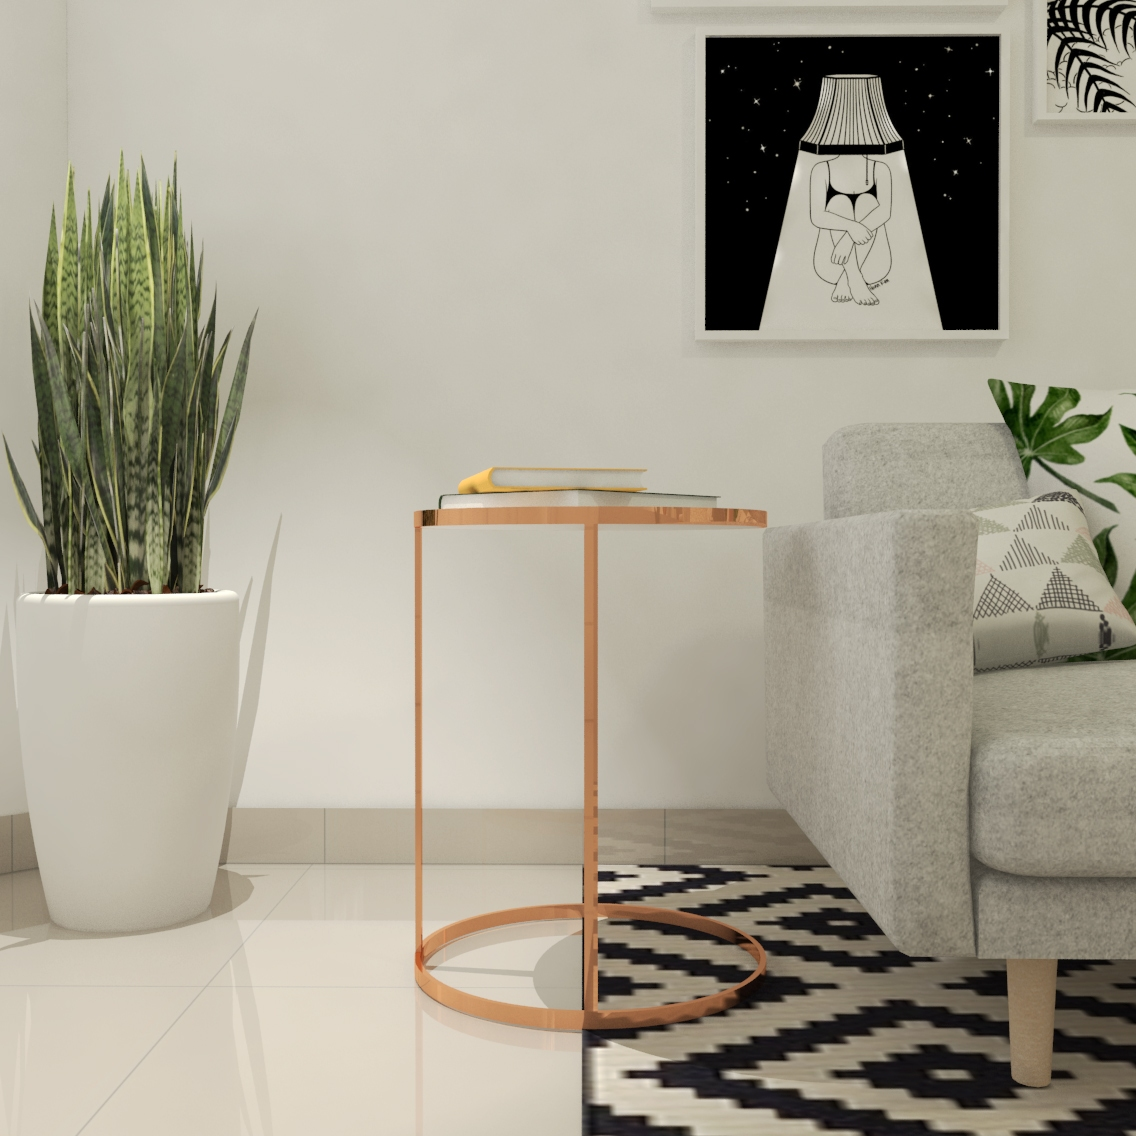 Sala de estar moderna - Projeto por Estúdio Murilo Zadulski Interiores - 01